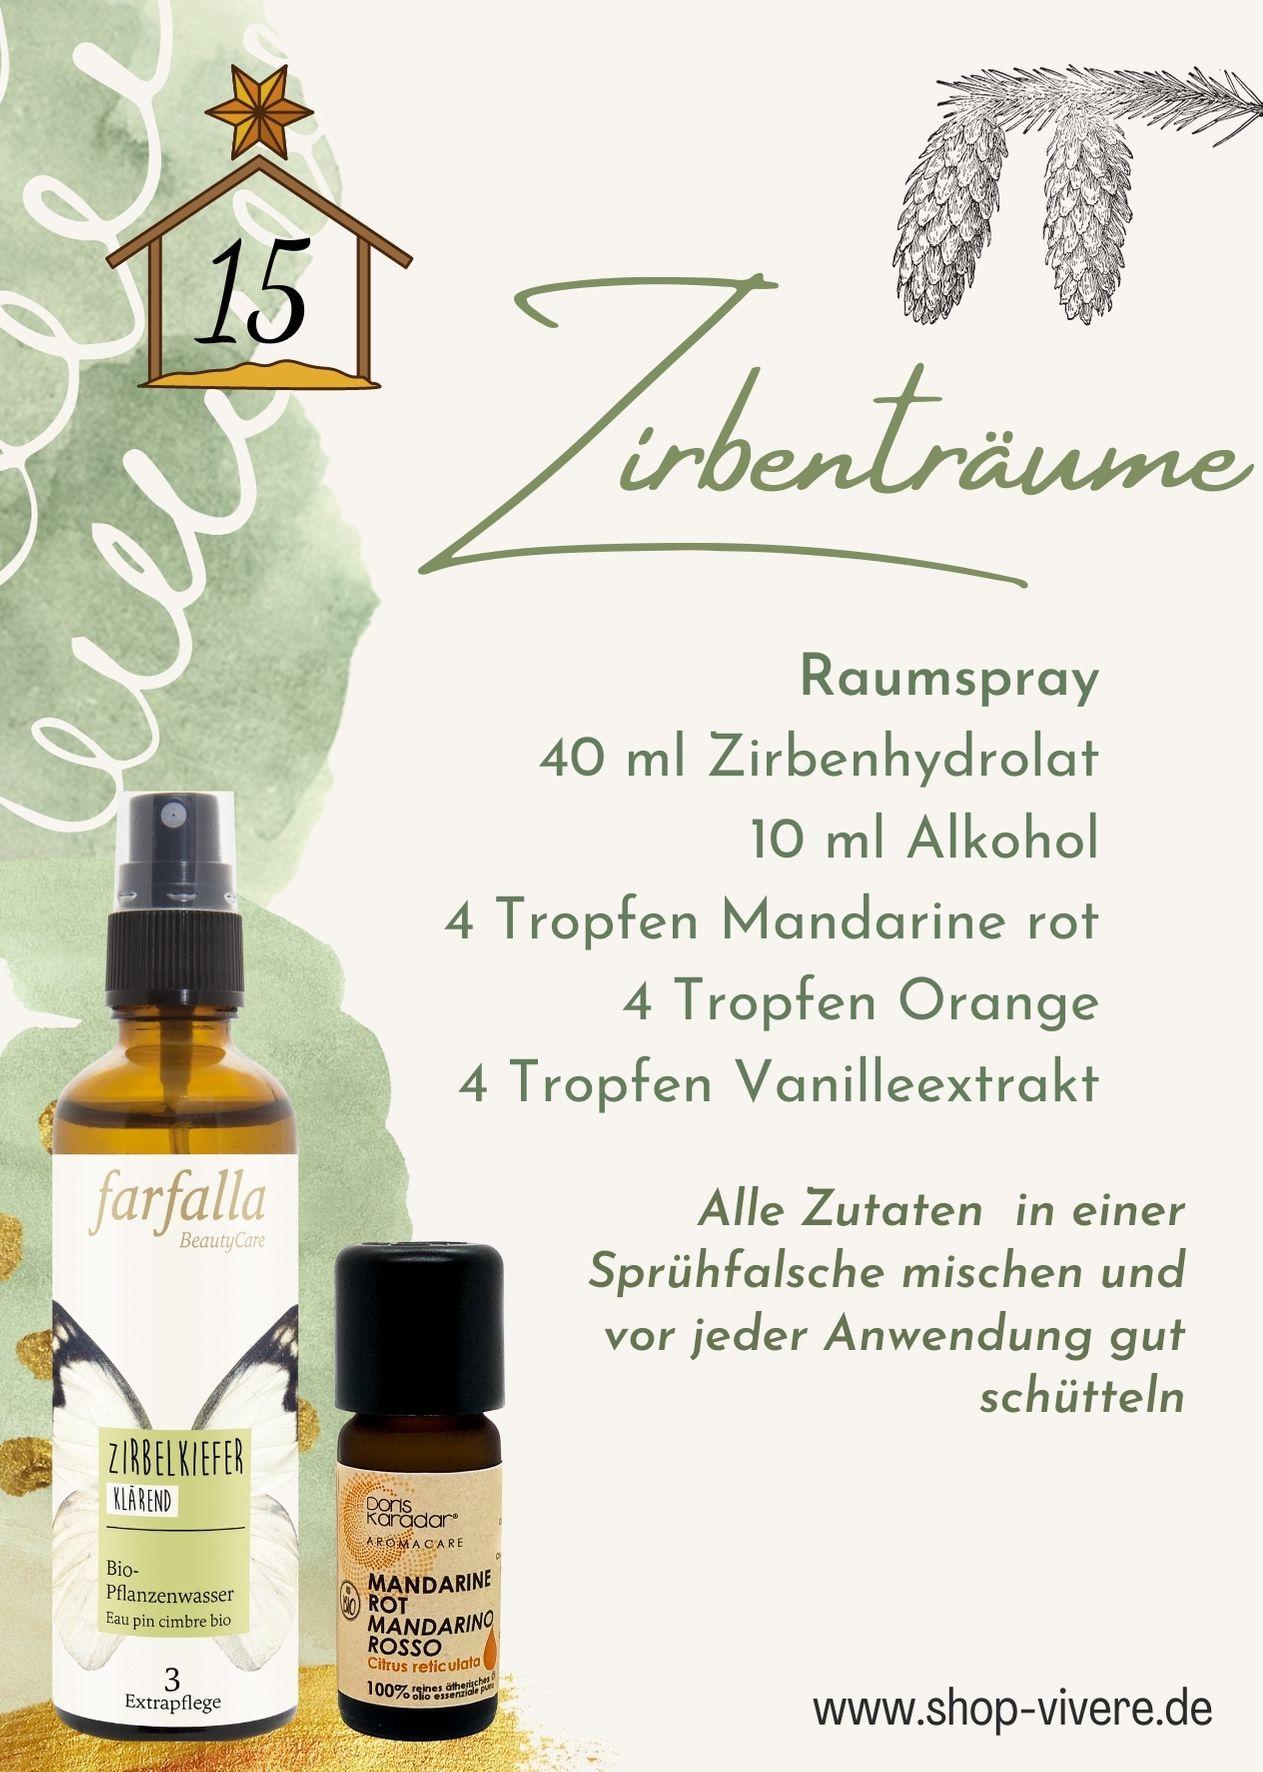 Adventskalender – Aromatherapie 15. Dezember